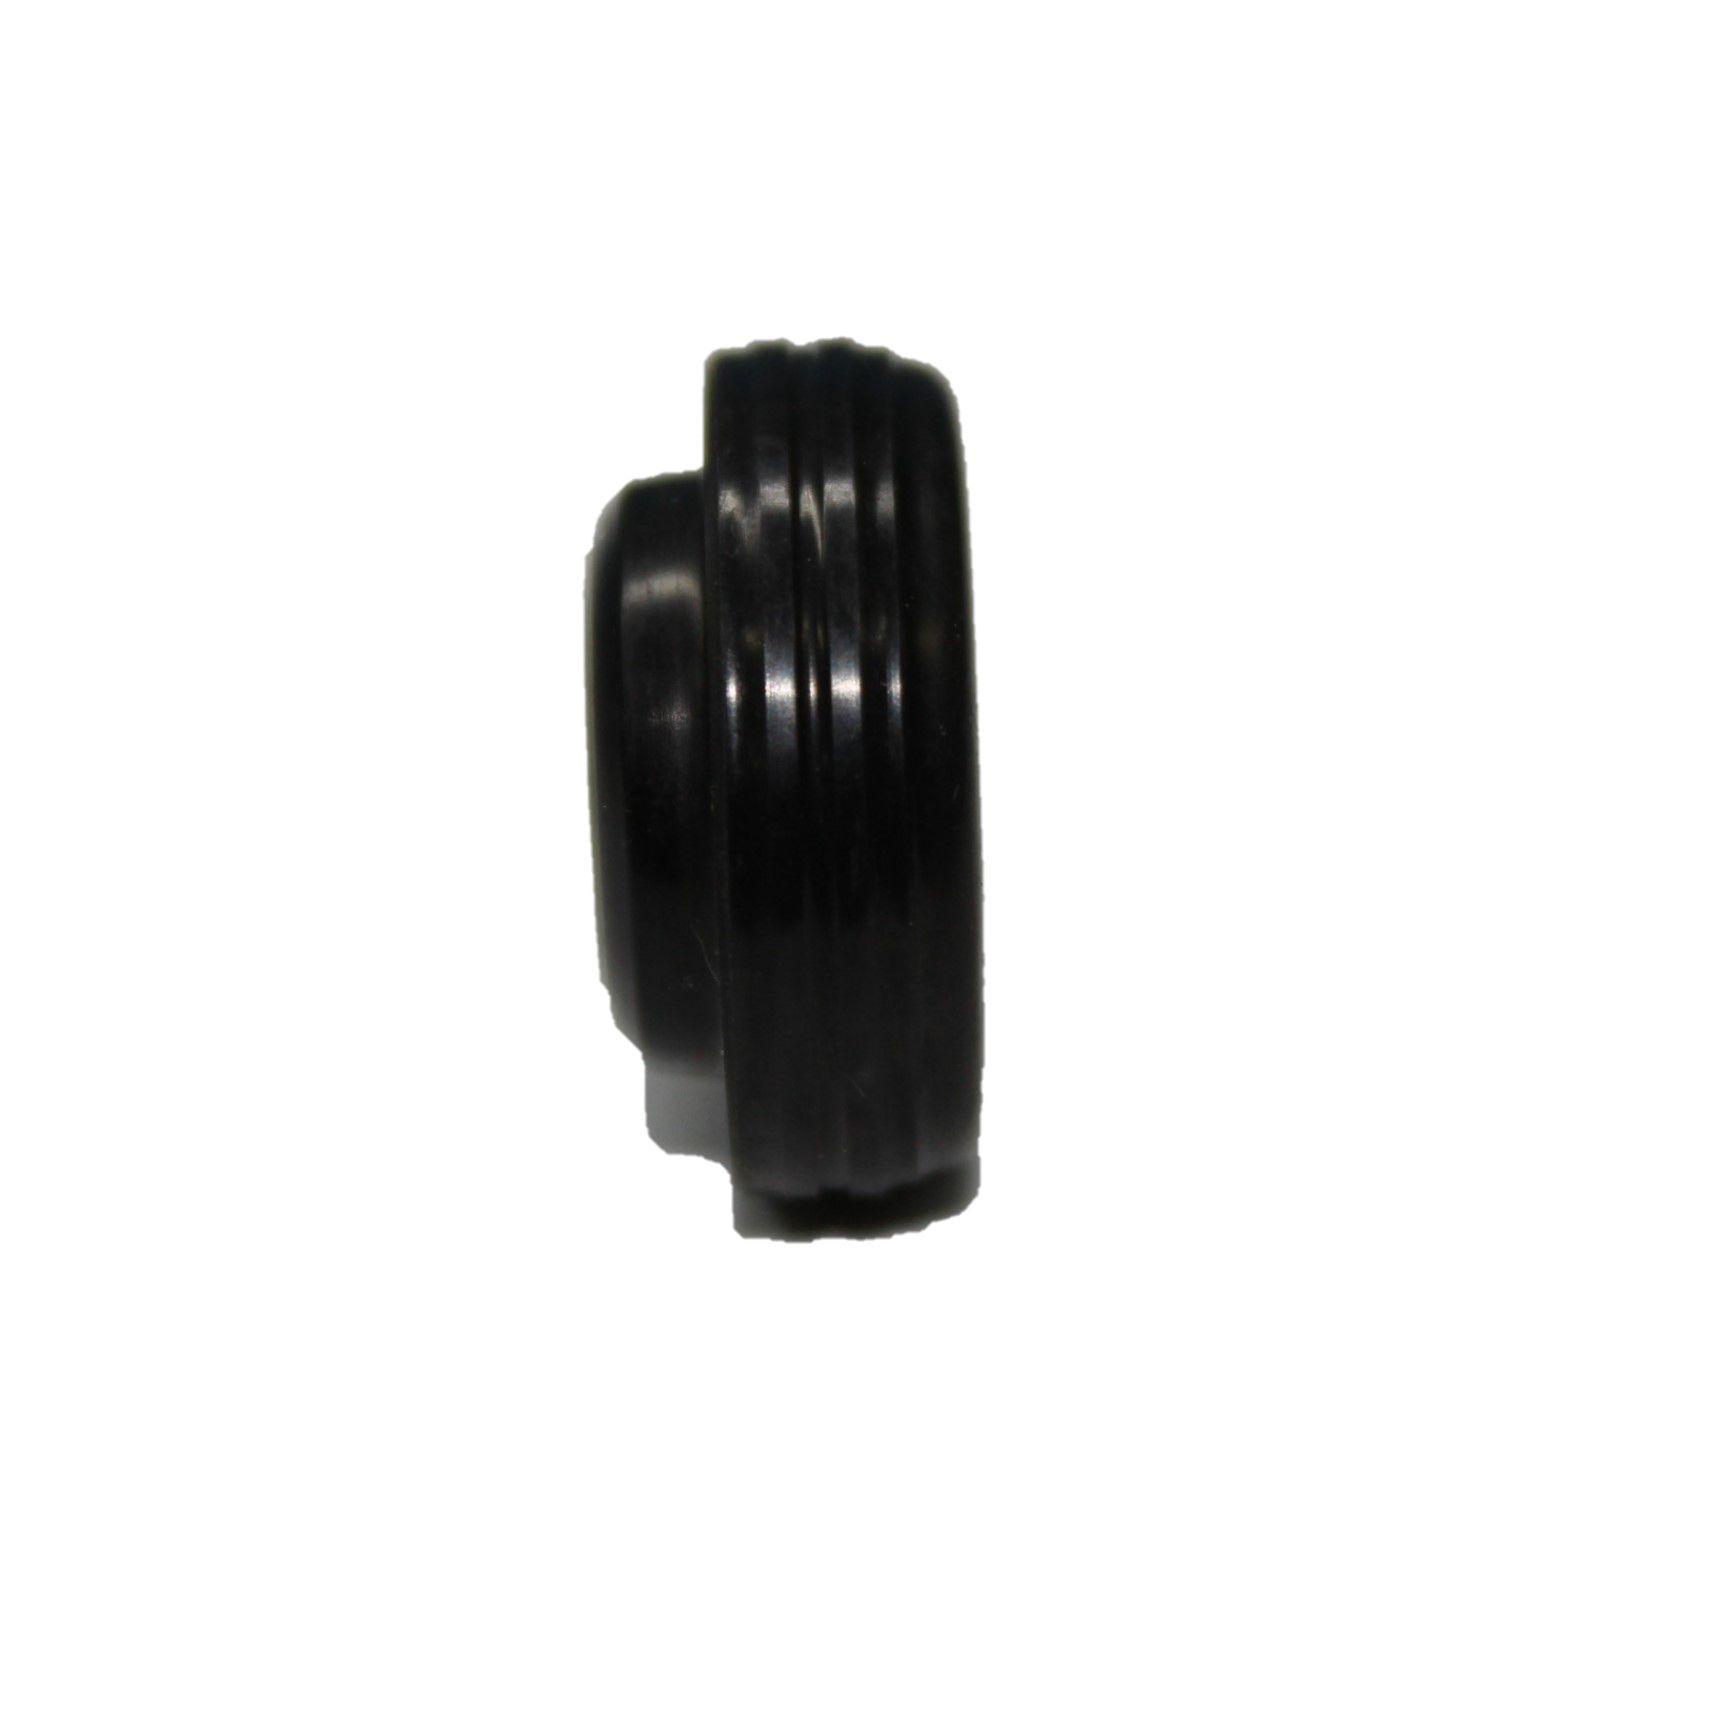 Selo Compressor Ar condicionado Civic, Onix, Prisma (13,4 X 24 X 12)